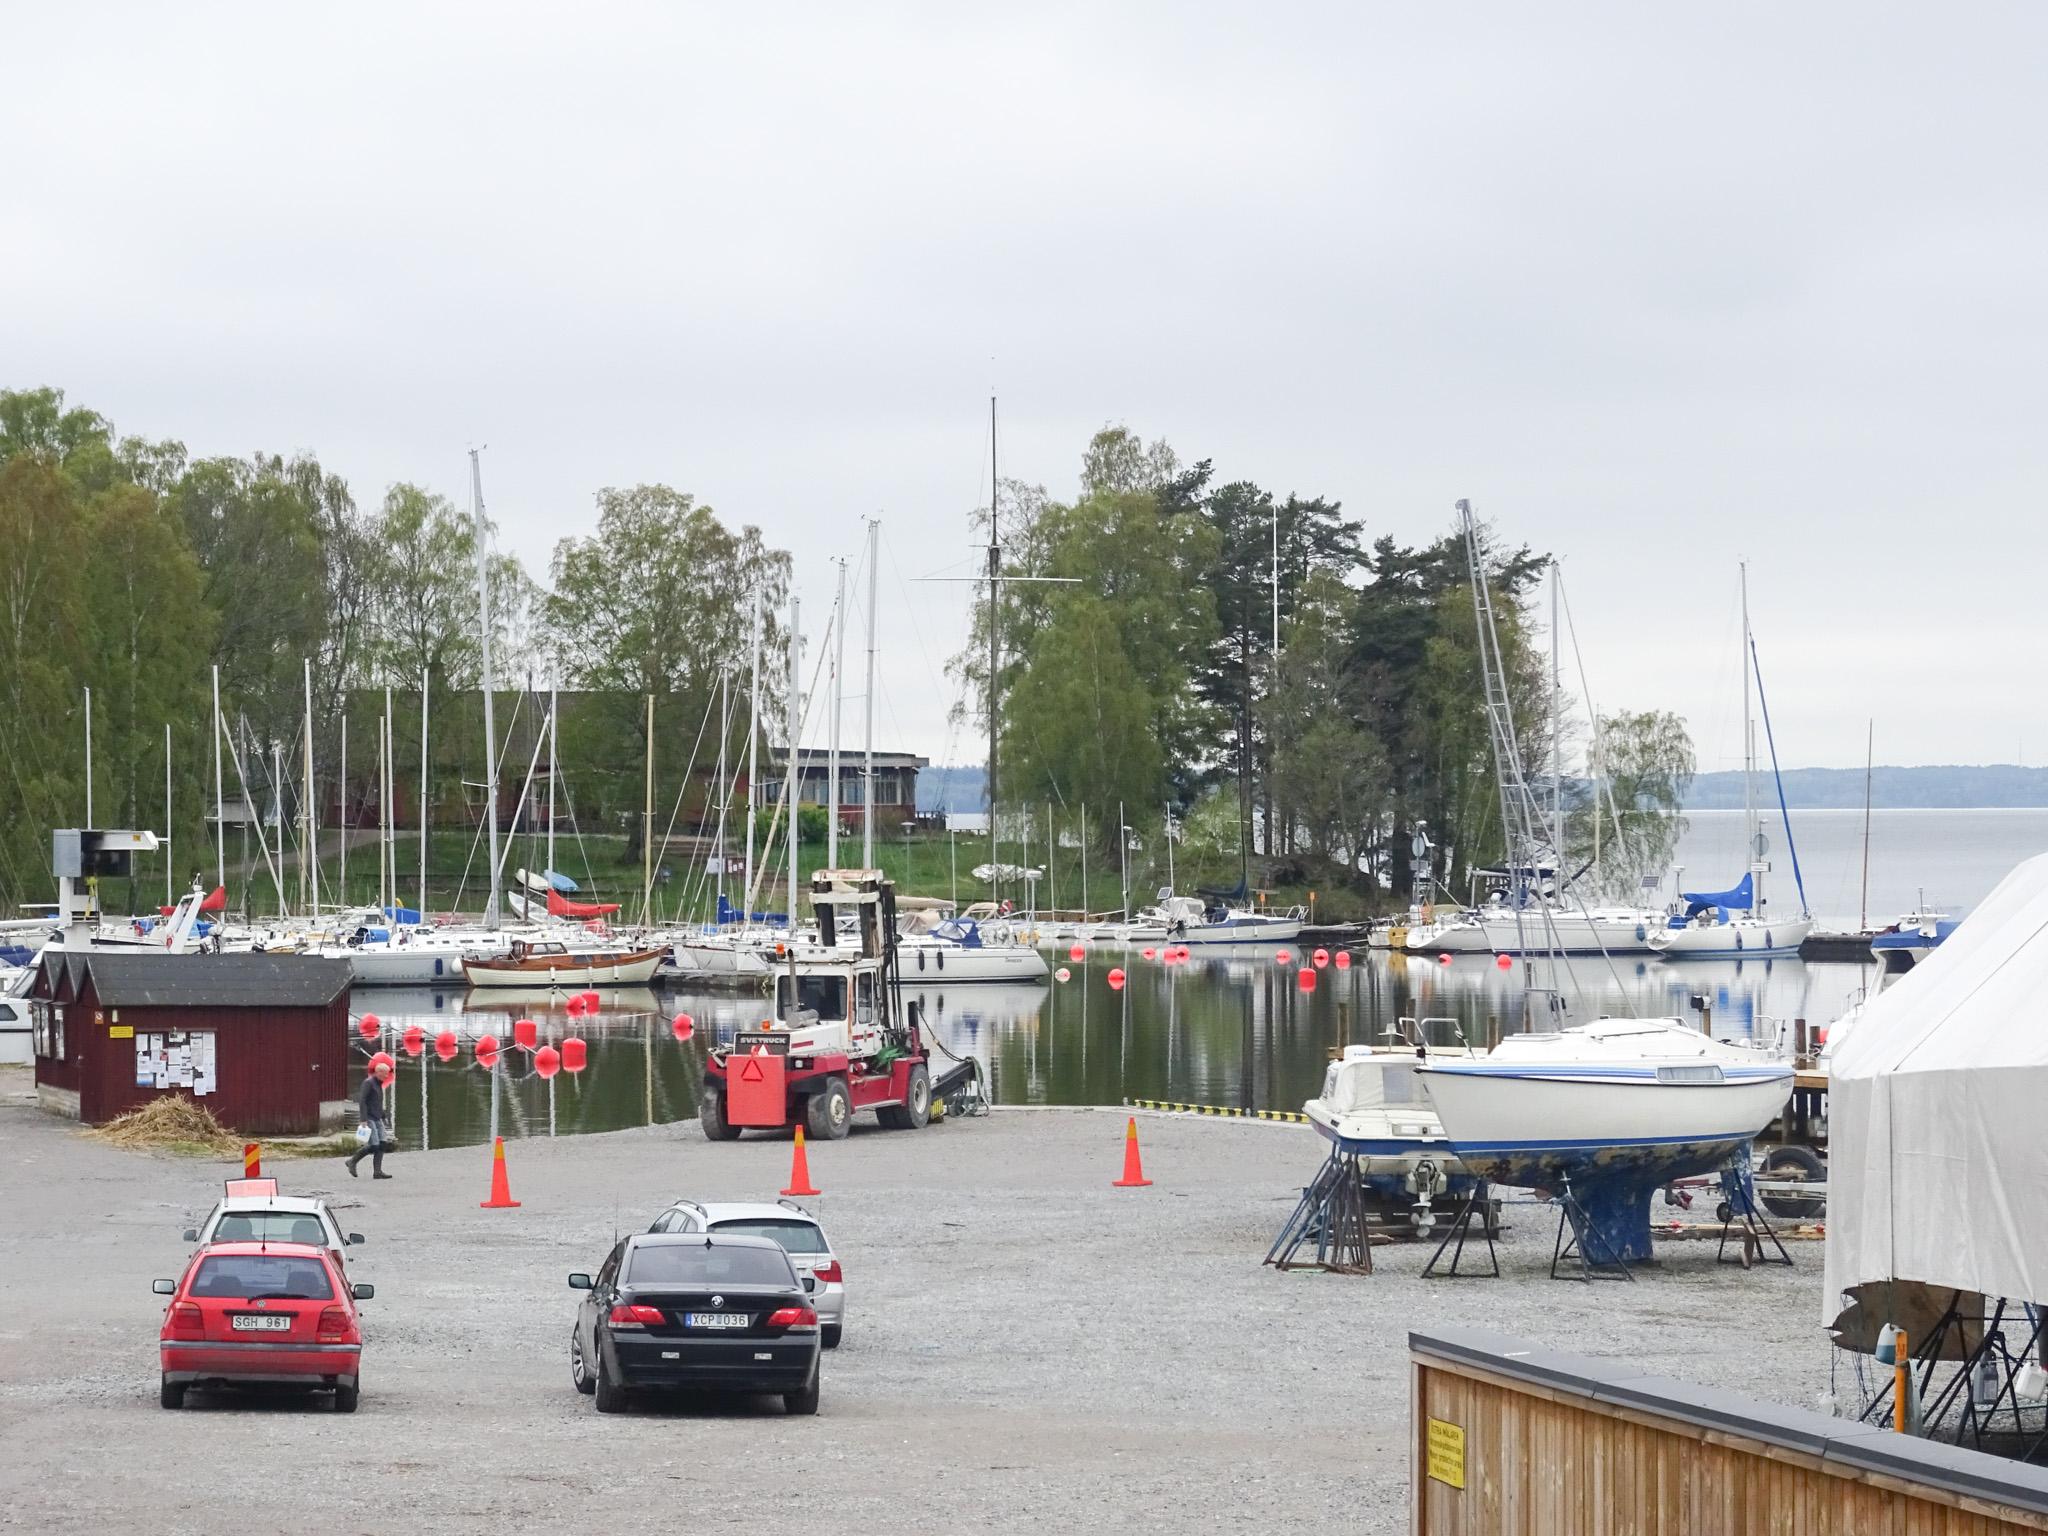 Hafen Rastaholm